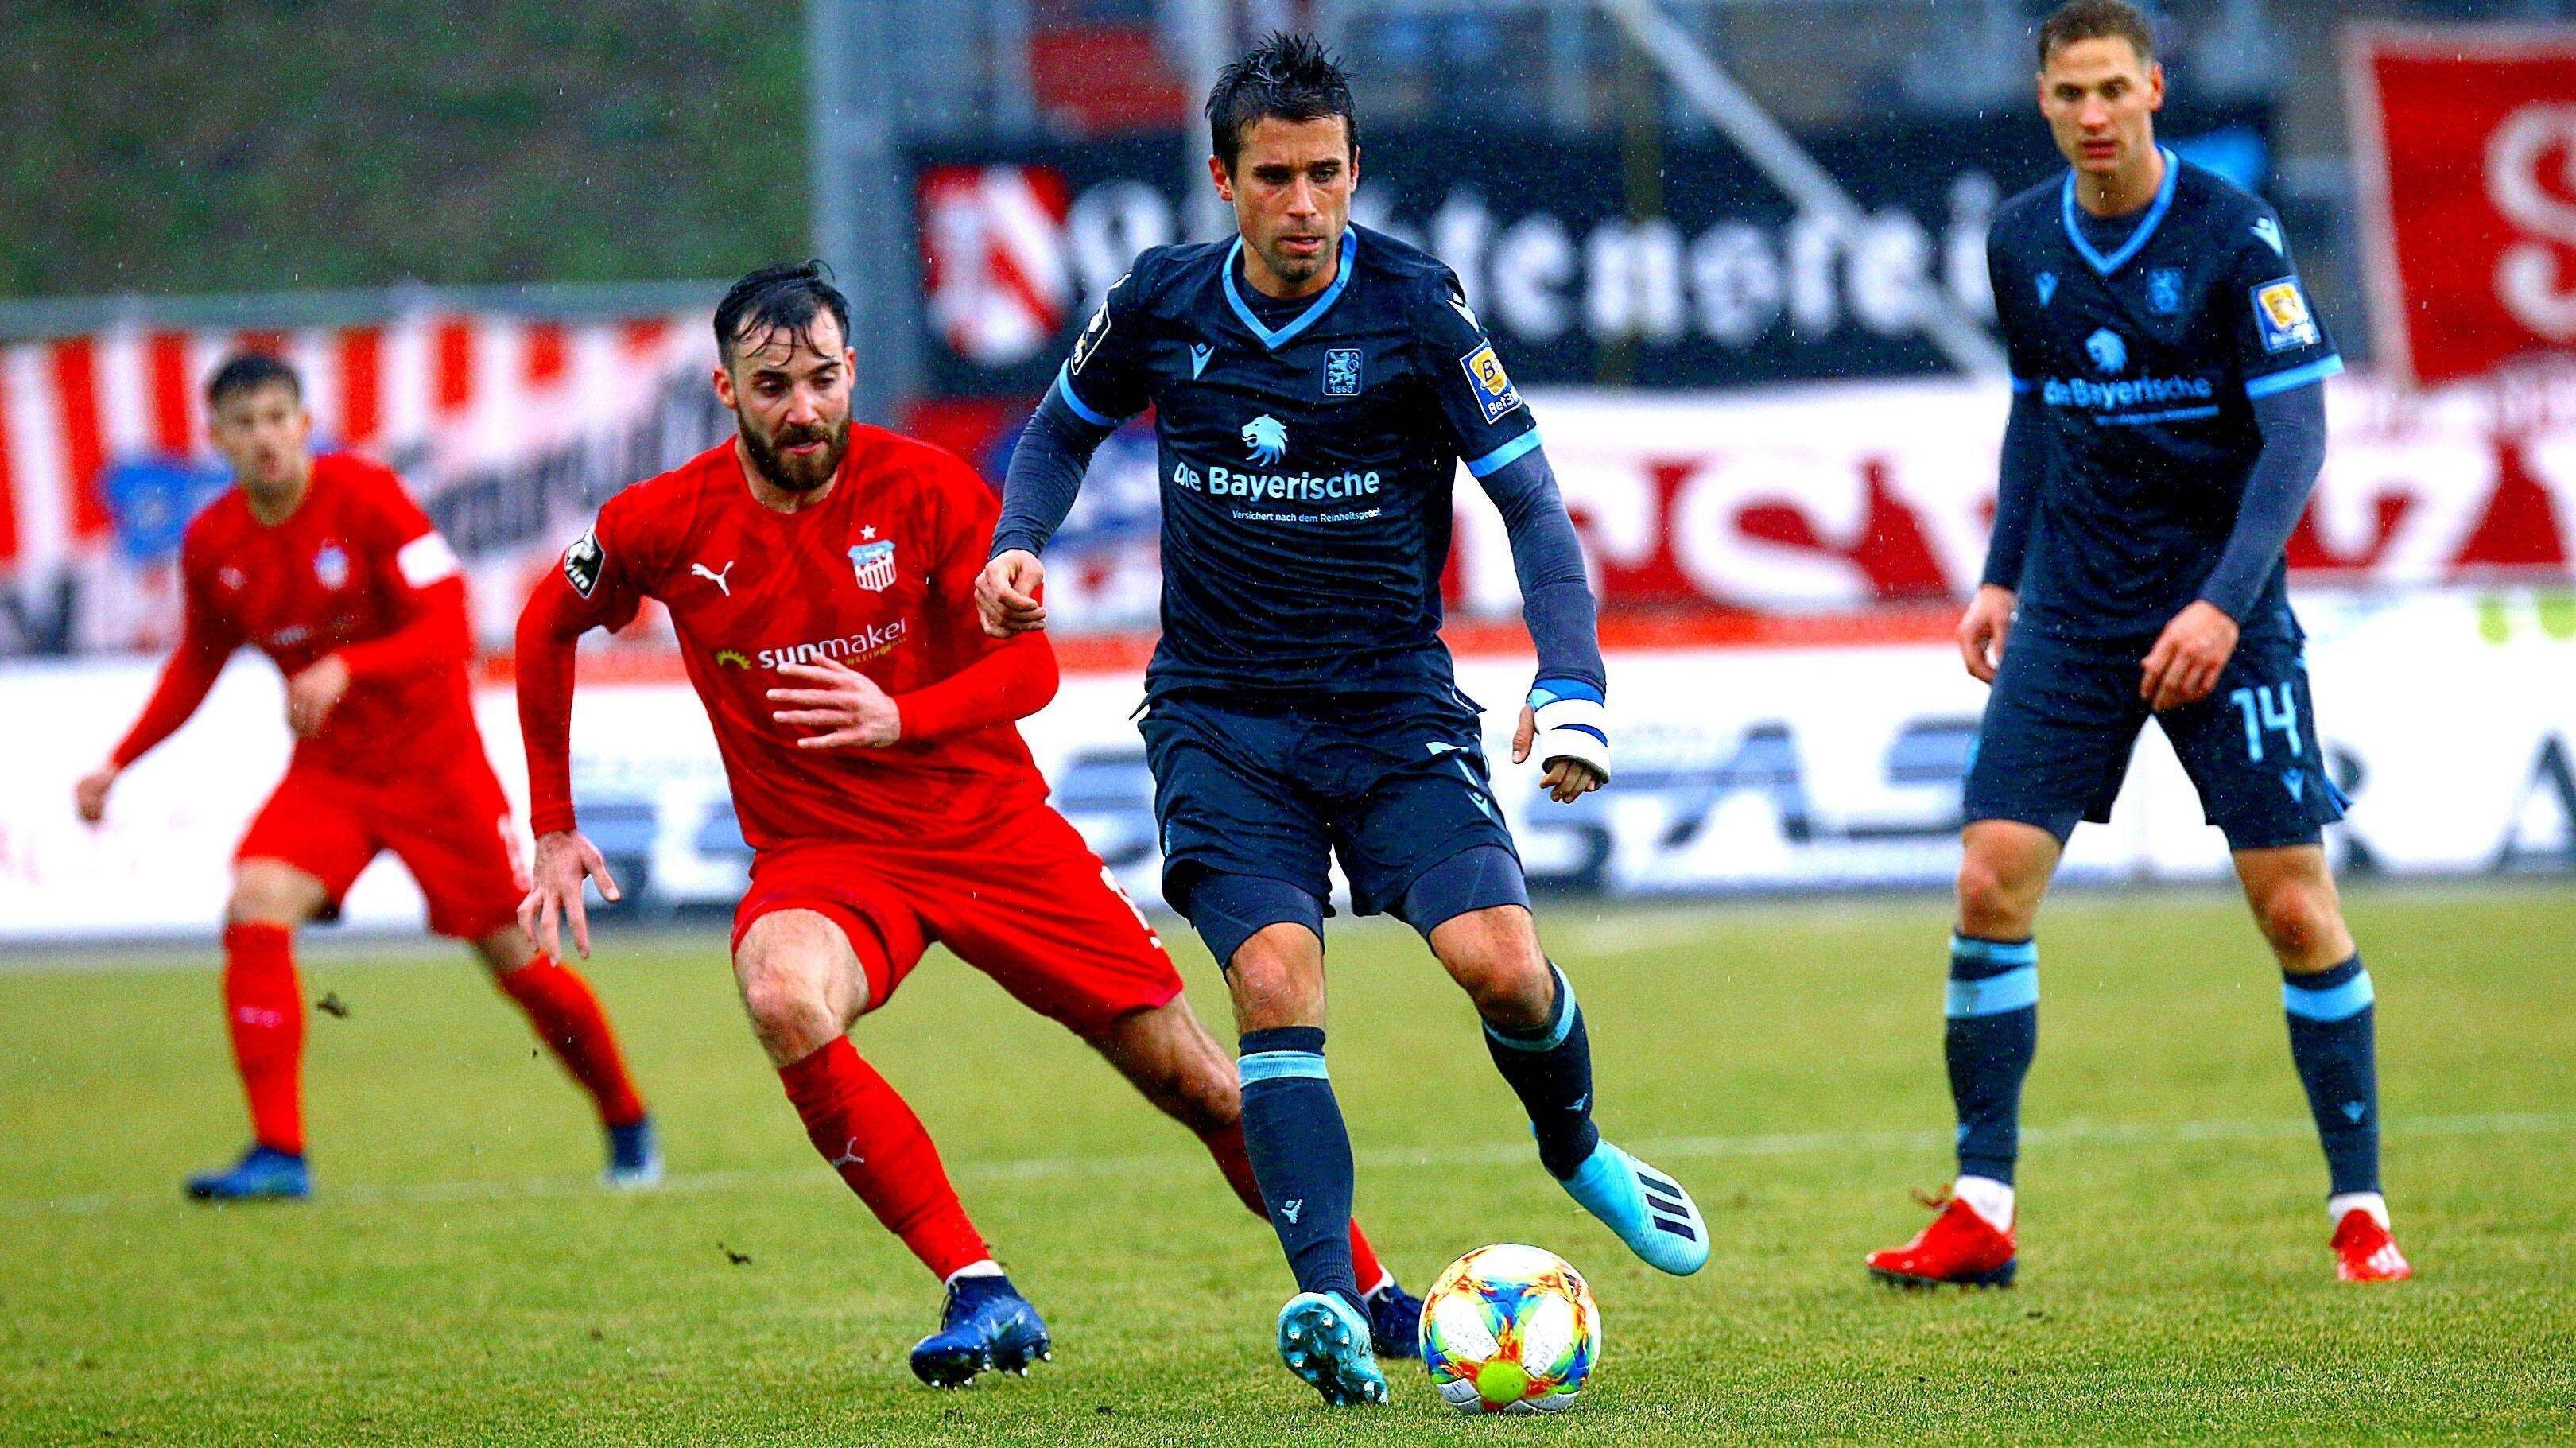 Szene aus dem Spiel Zwickau gegen den TSV 1860 München